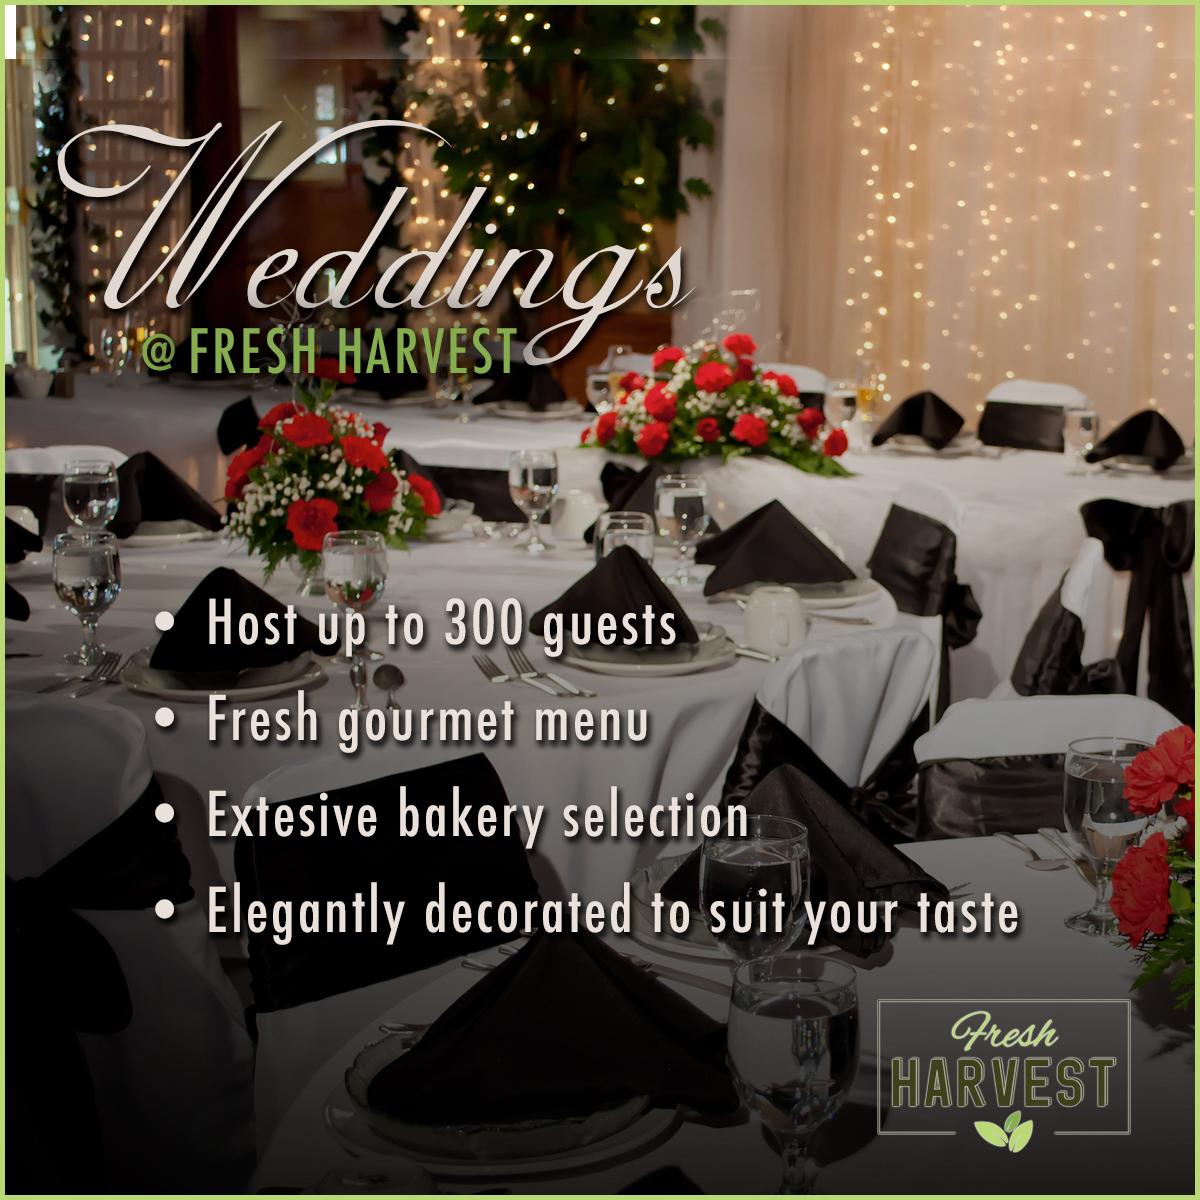 Ad-Weddings